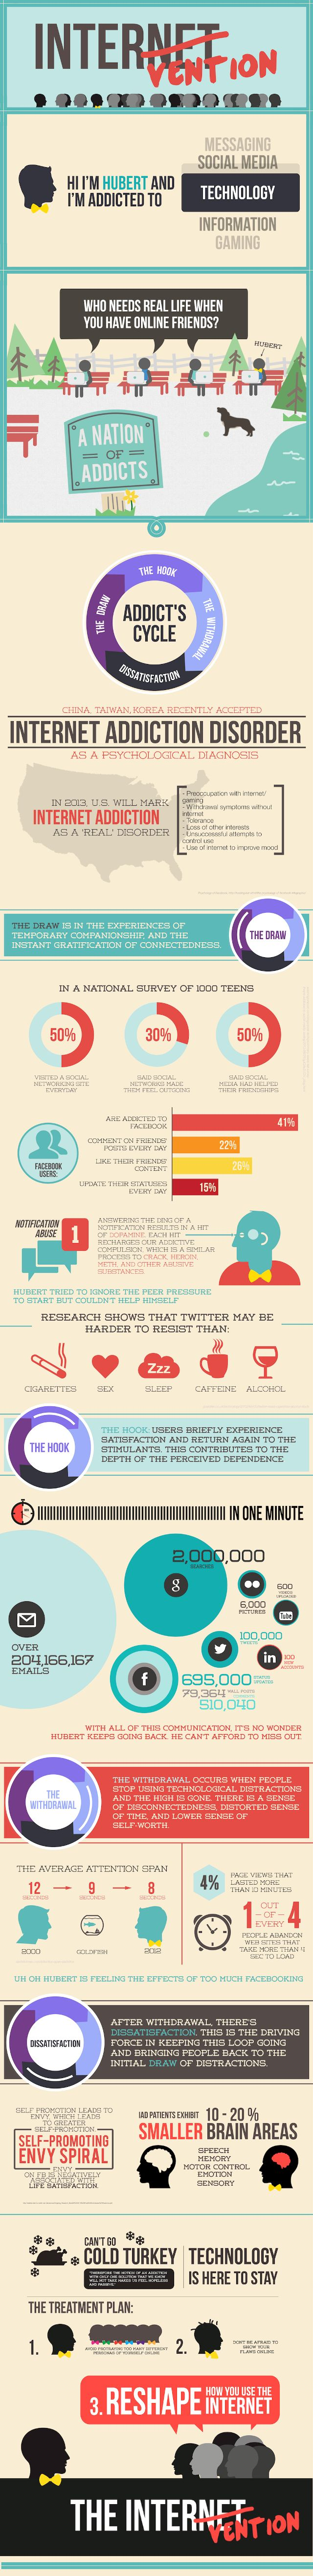 How To Intervene Internet Addiction Disorder [INFOGRAPHIC]